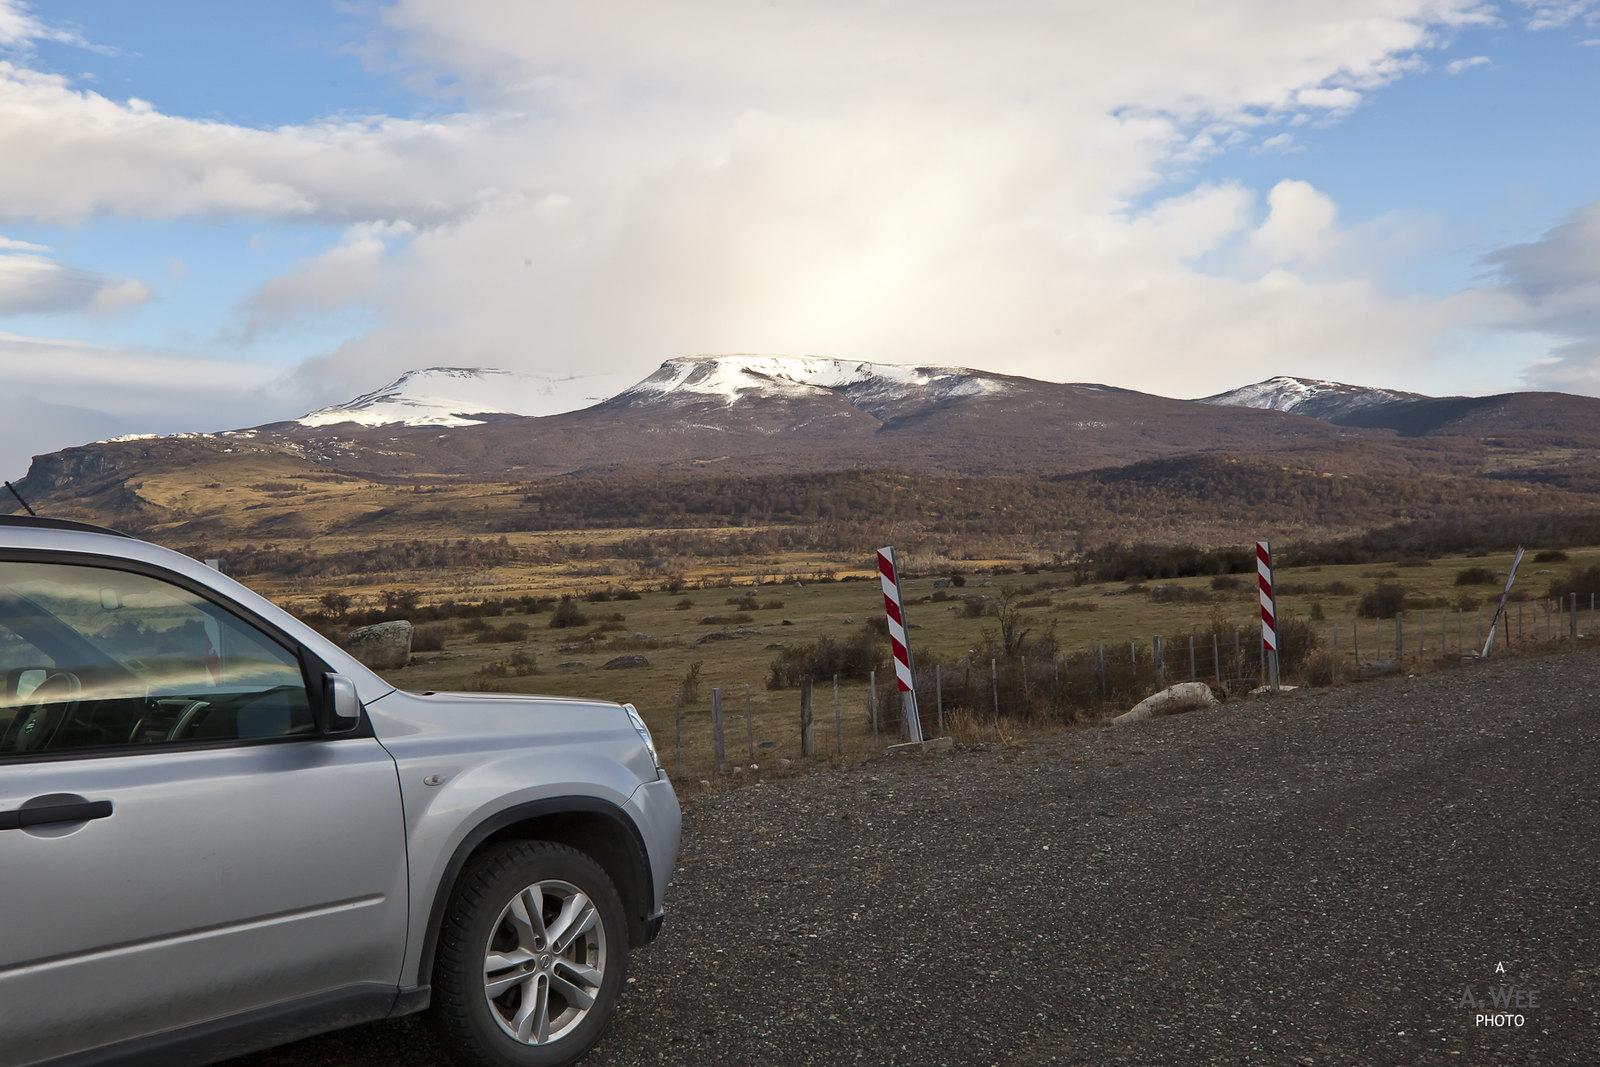 X-Trail roadtrip